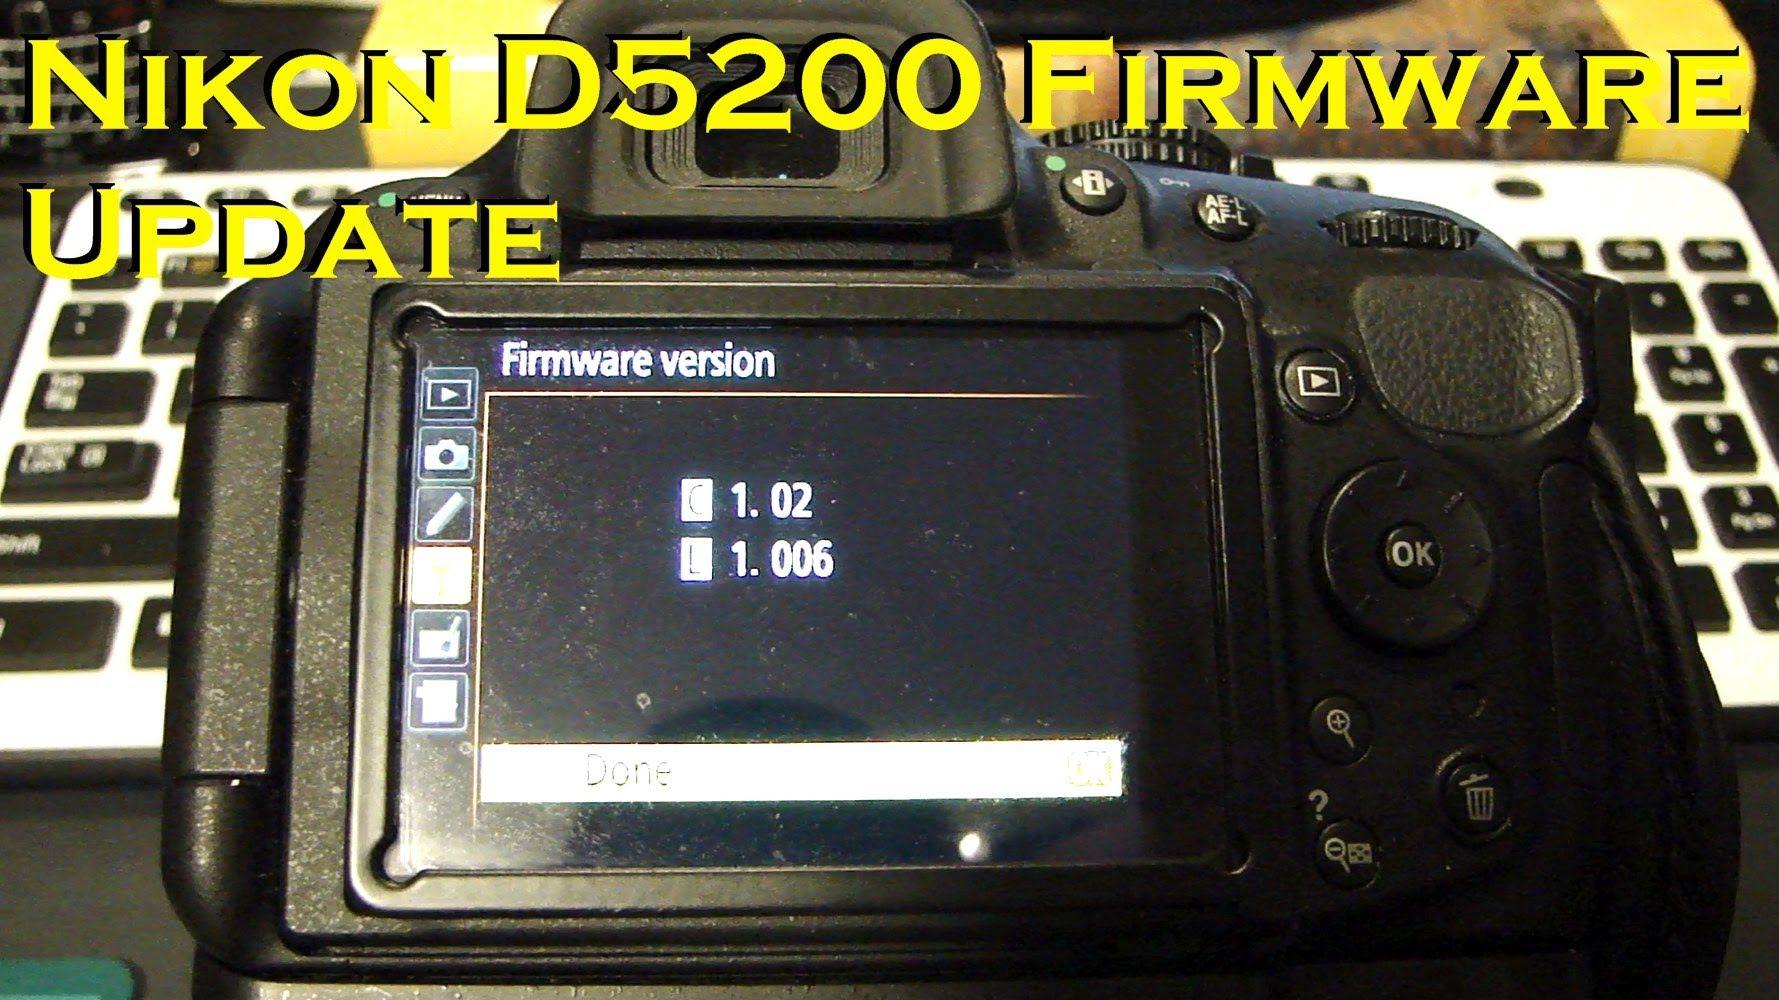 How To Update Nikon D5200 Firmware (DSLR Camera